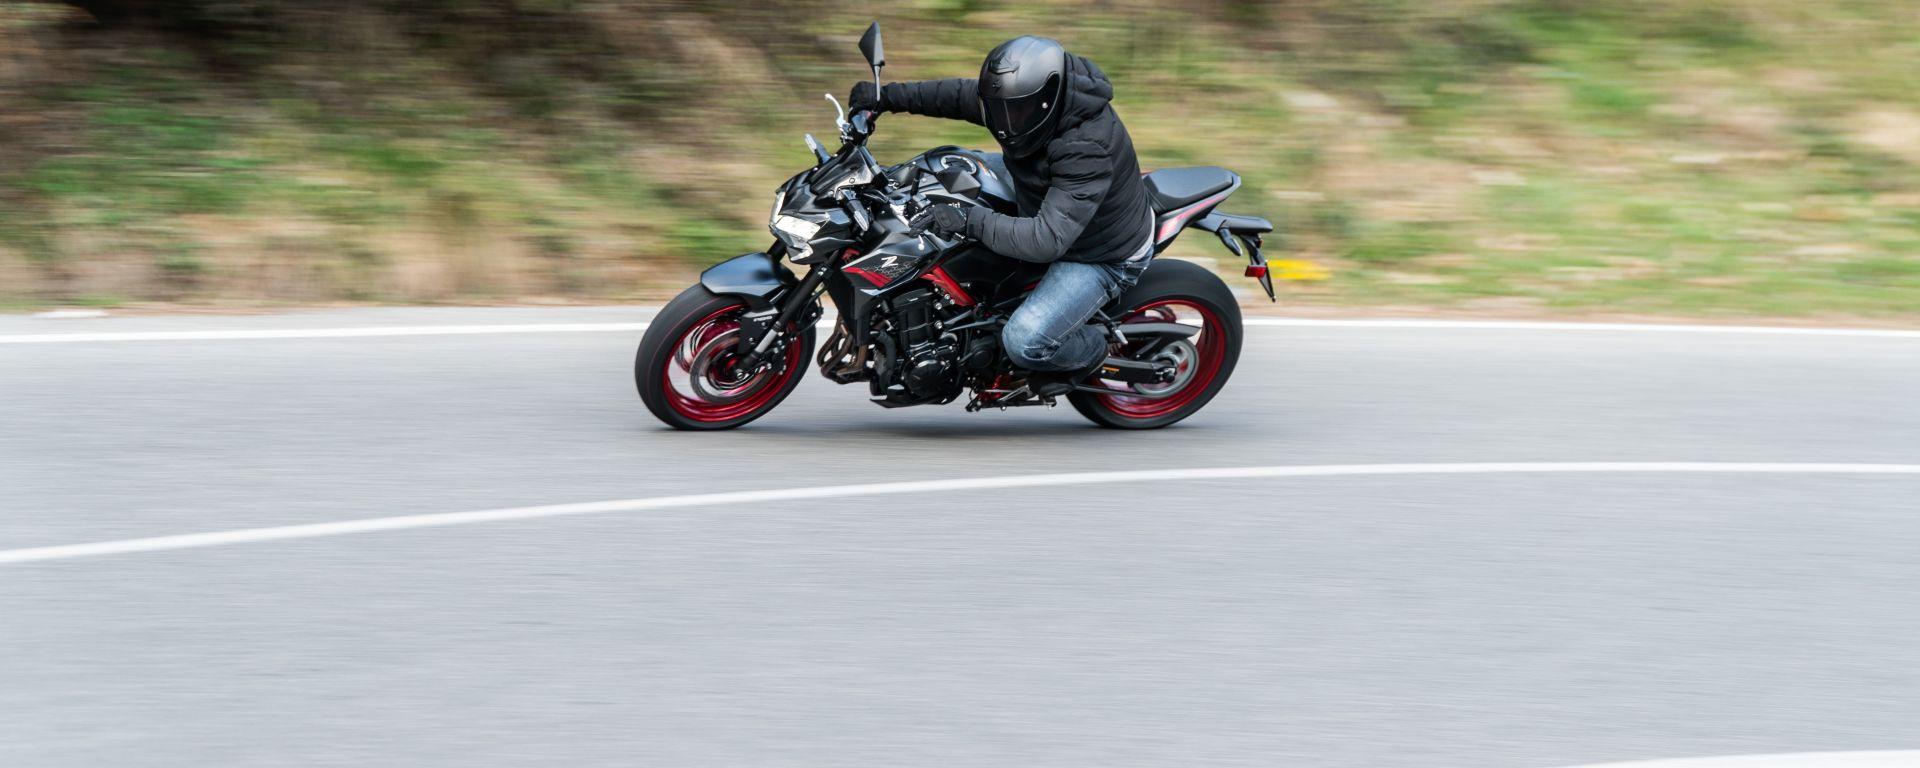 Kawasaki Z900 70 kW: la prova